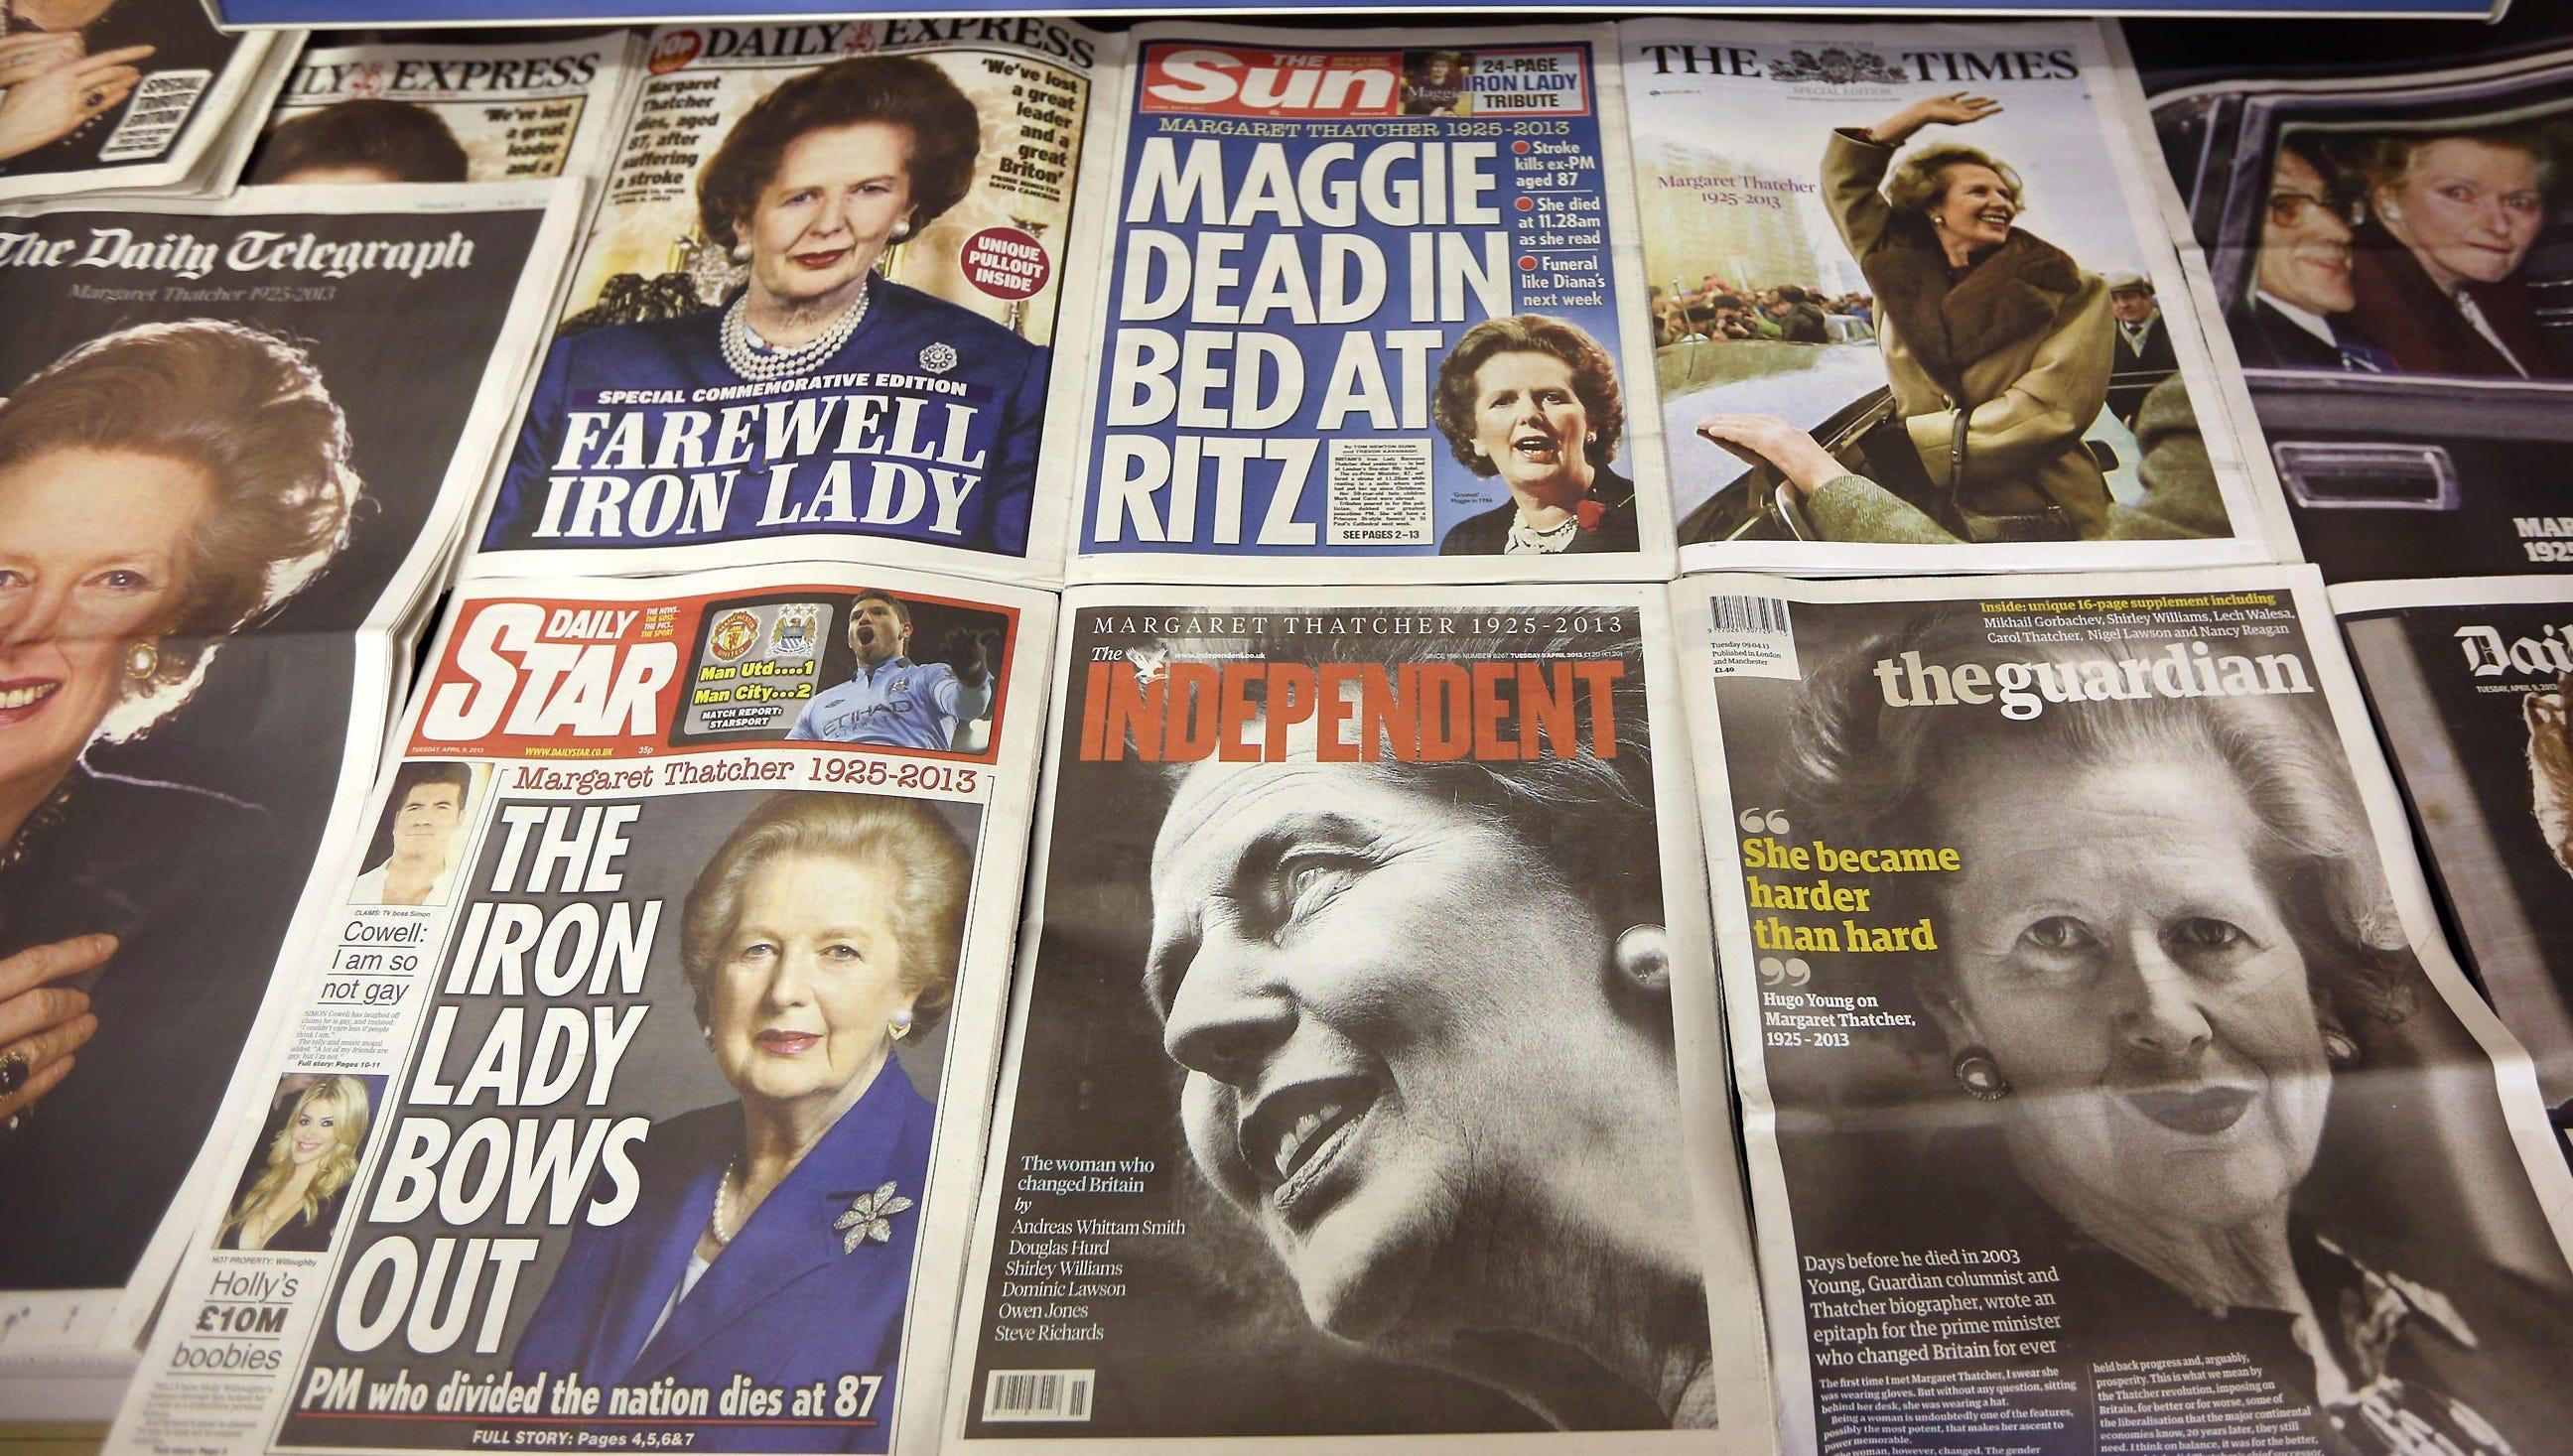 Margaret Thatcher Funeral Set For Next Week